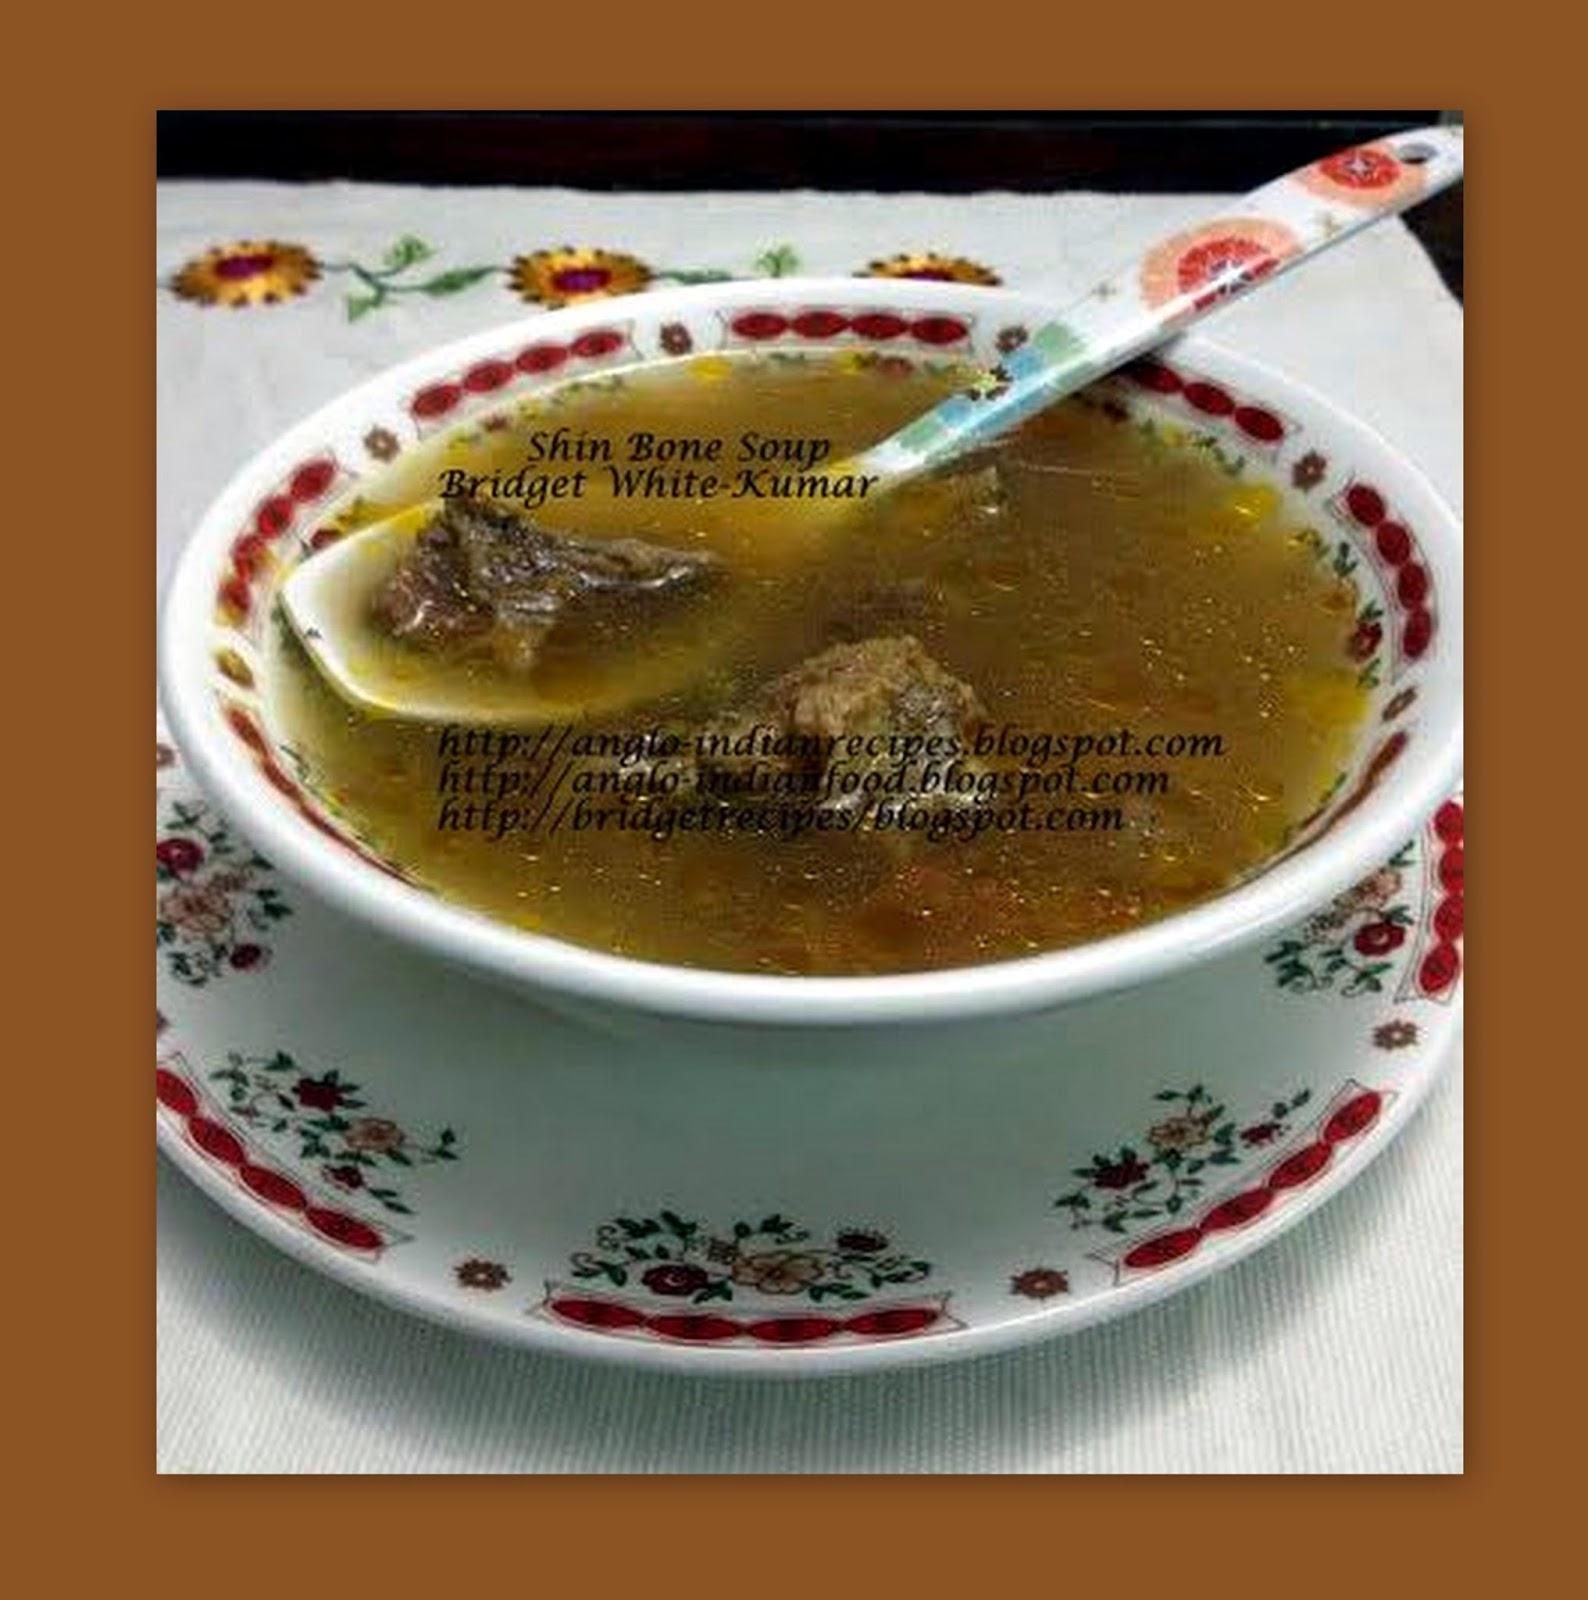 Anglo indian recipes by bridget white shin bone soup shin bone soup forumfinder Gallery